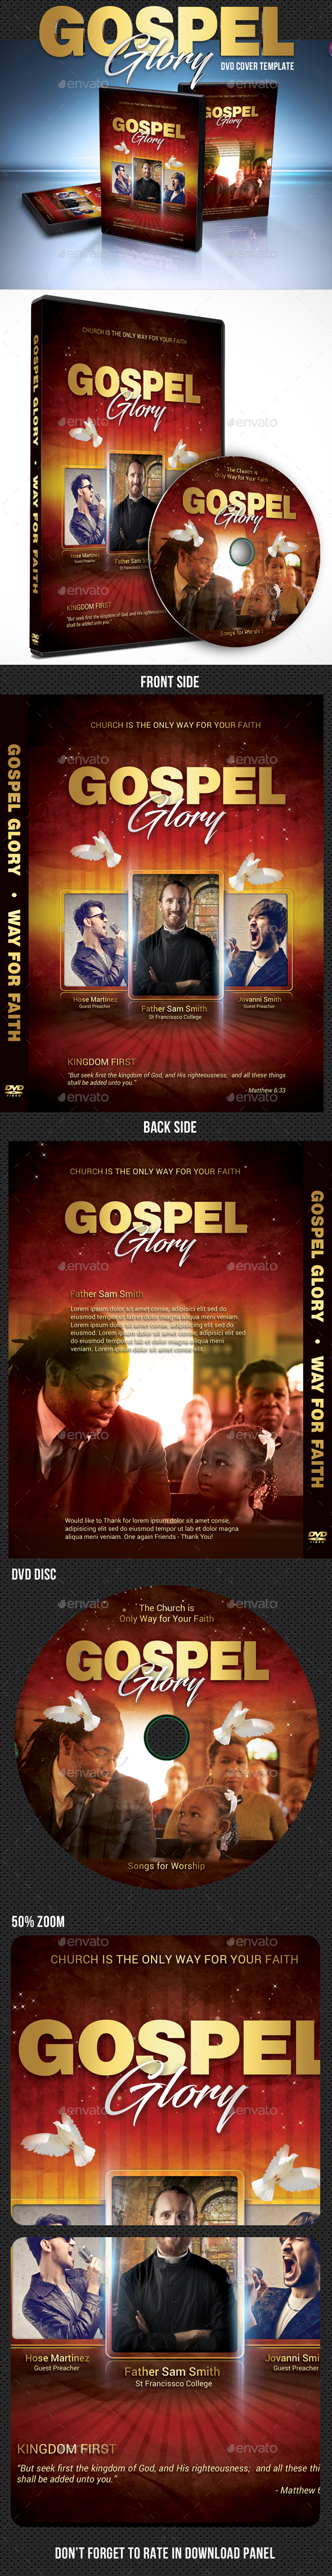 Gospel Glory DVD Cover Template